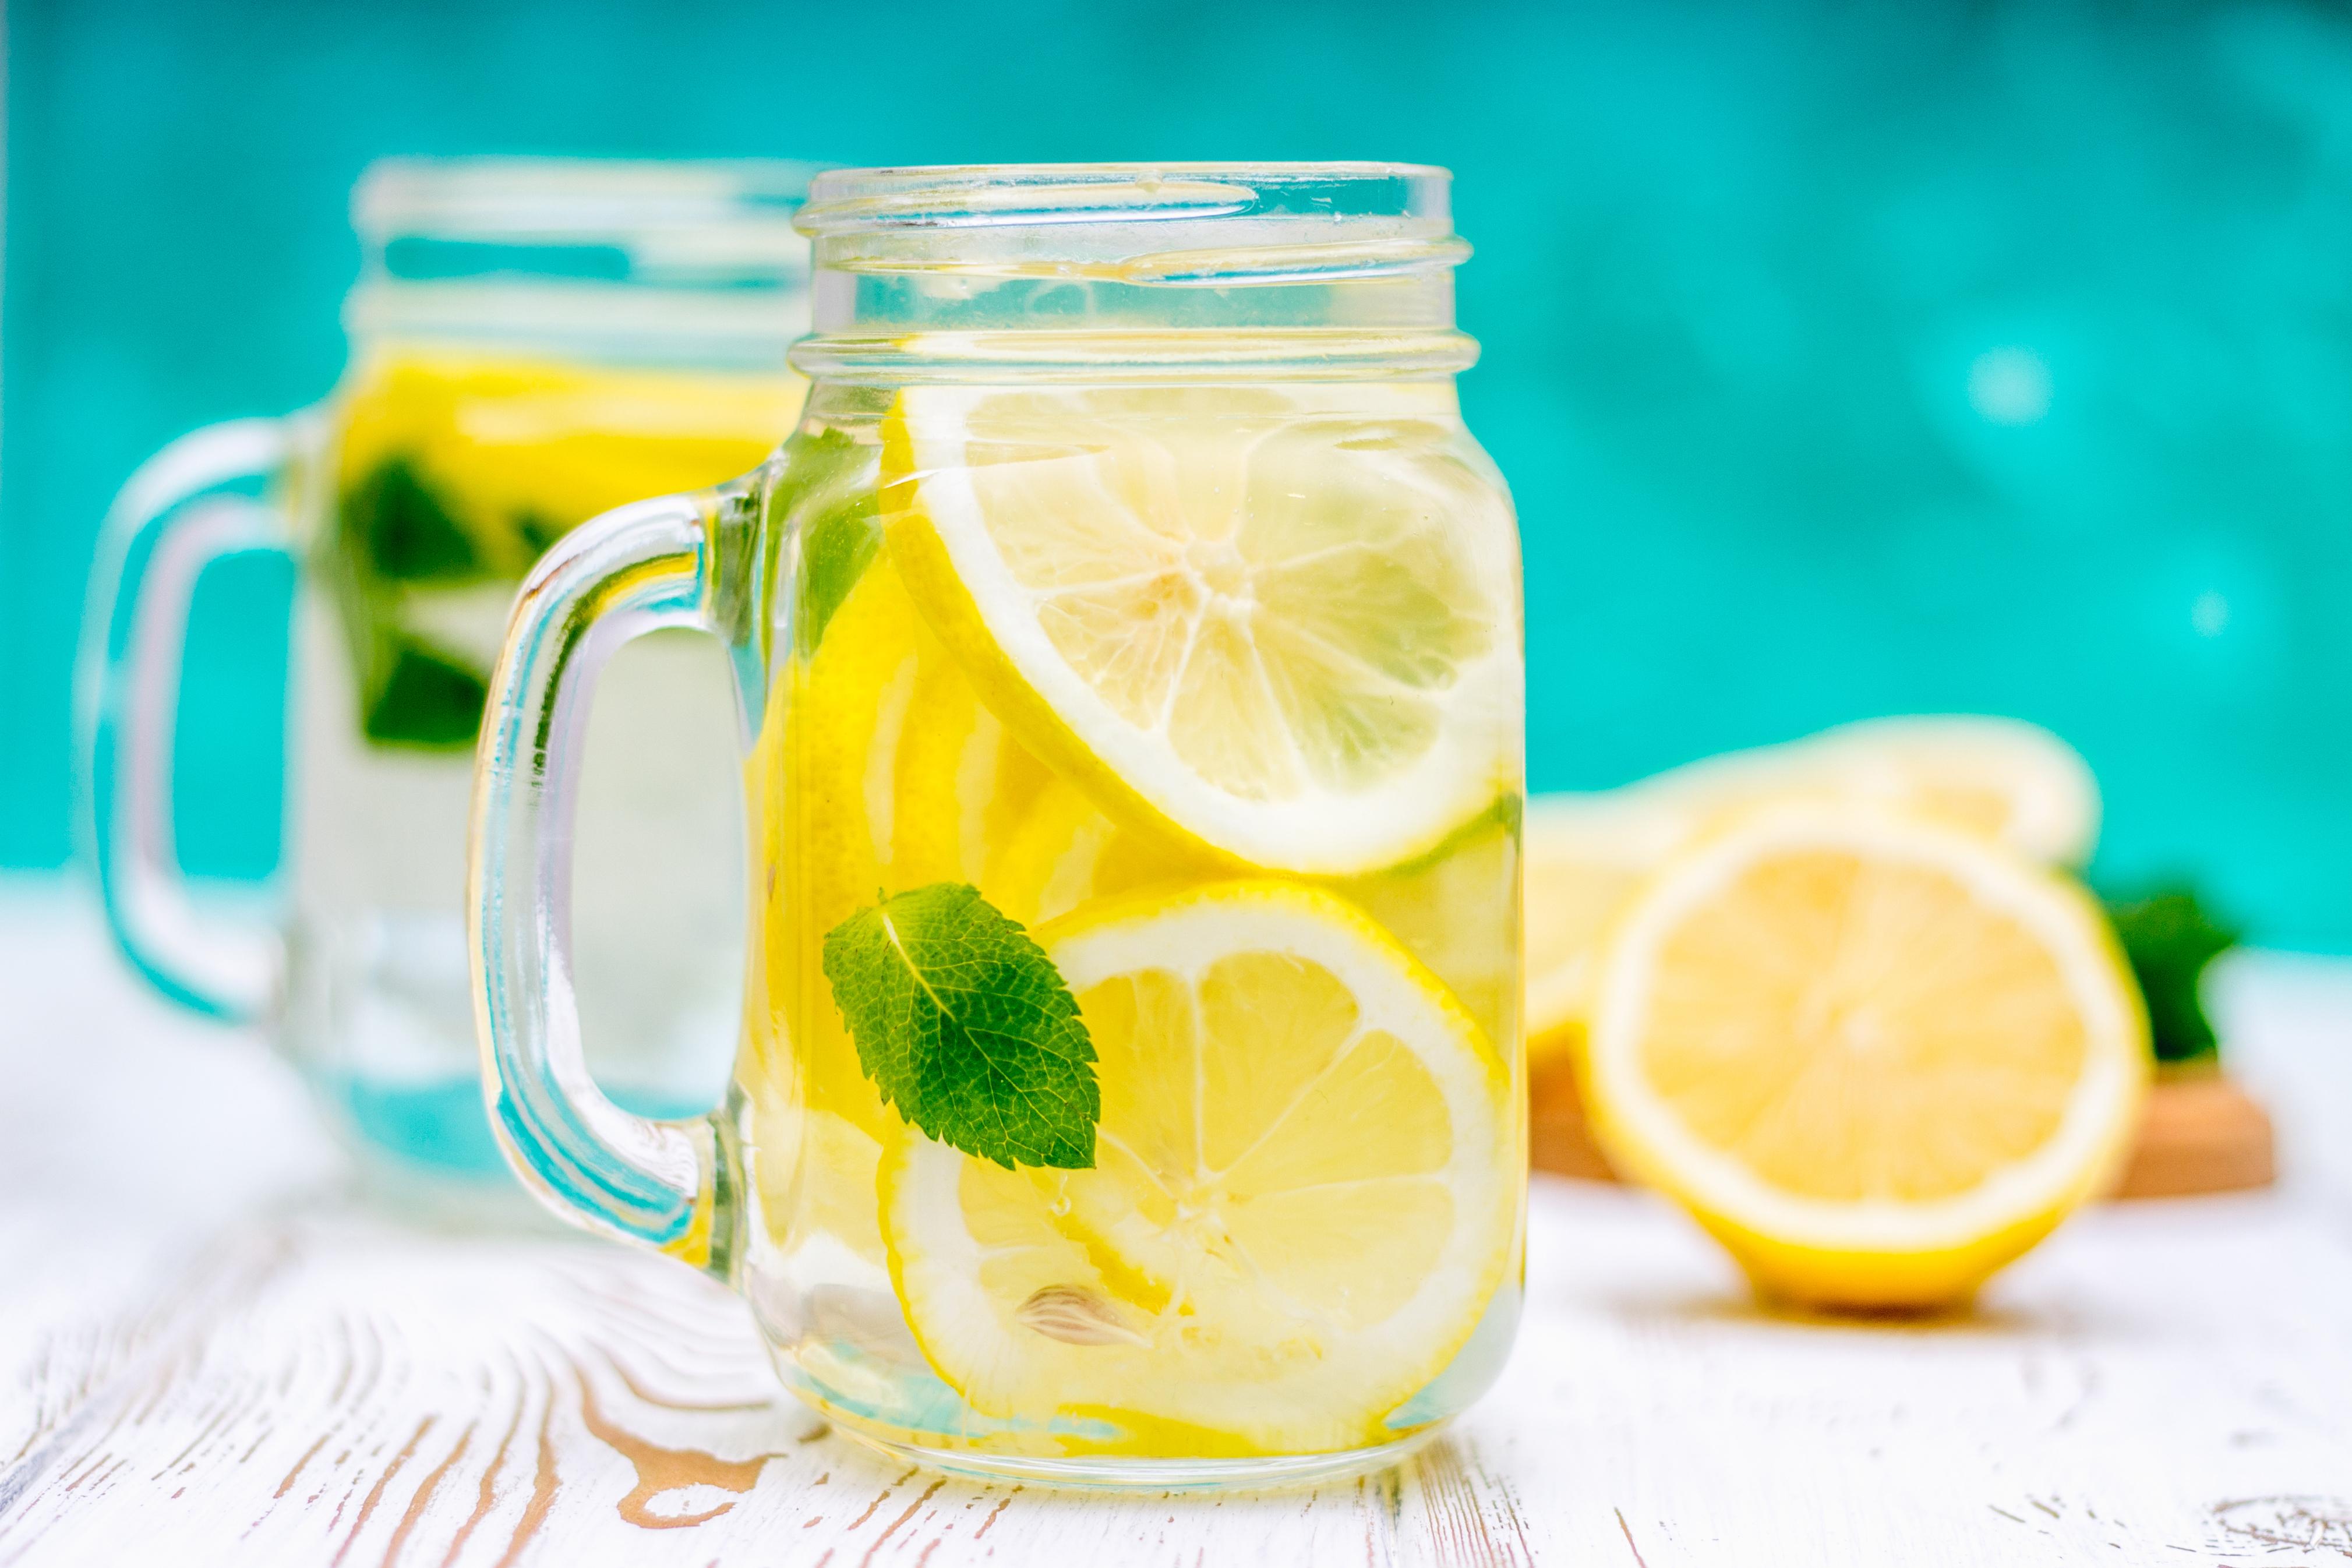 How Lemon Juice & Himalayan Salt Can Stop Migraines In Their Tracks